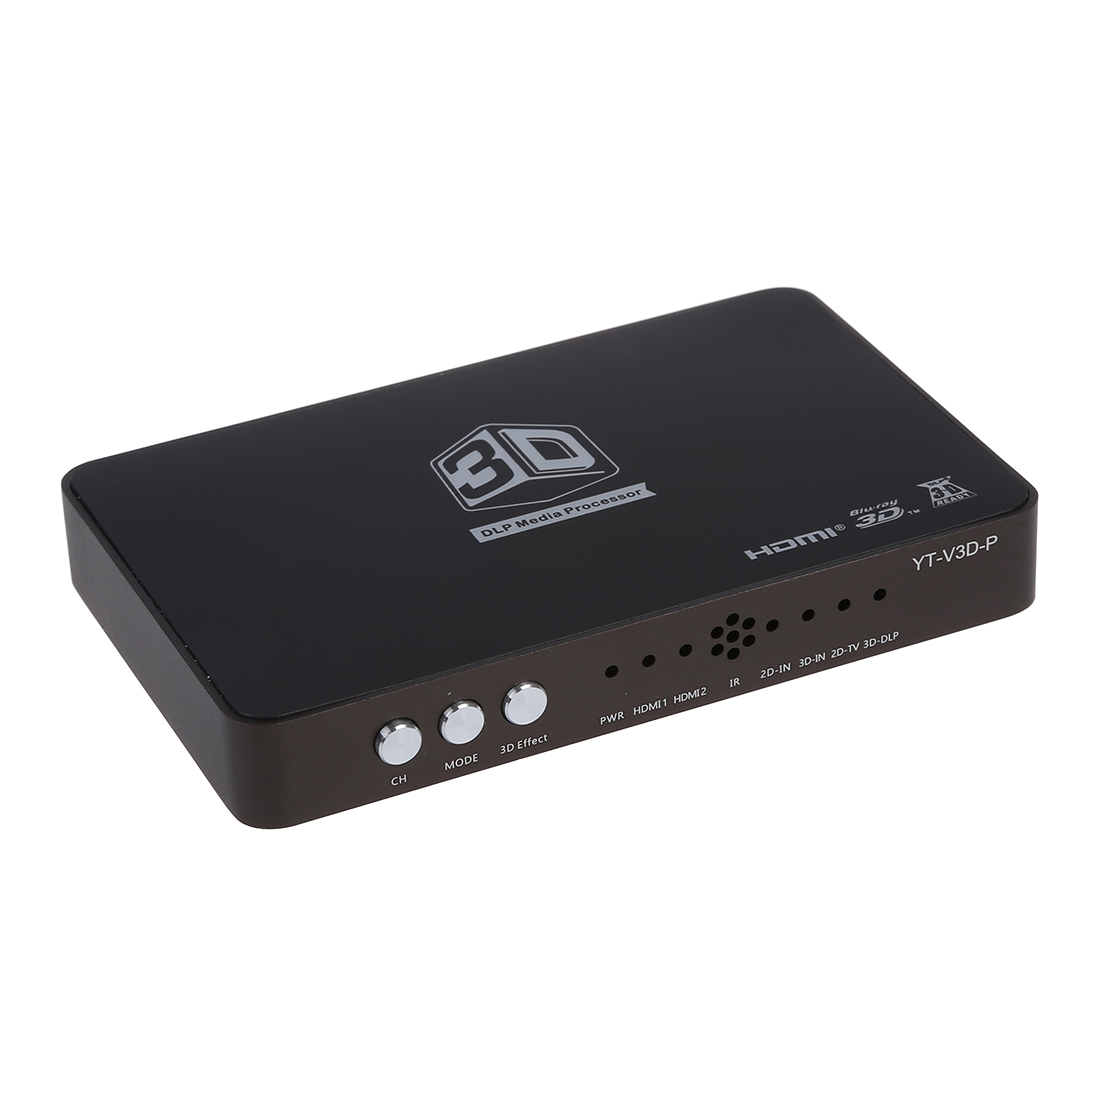 3d DLP Converter 2x1 Hdmi 1.4 for 120hz 3d Ready DLP Projector Black 3d очки oem 3d dlp link dlp 3d optoma lg acer benq w1070 3d dlp cx 30